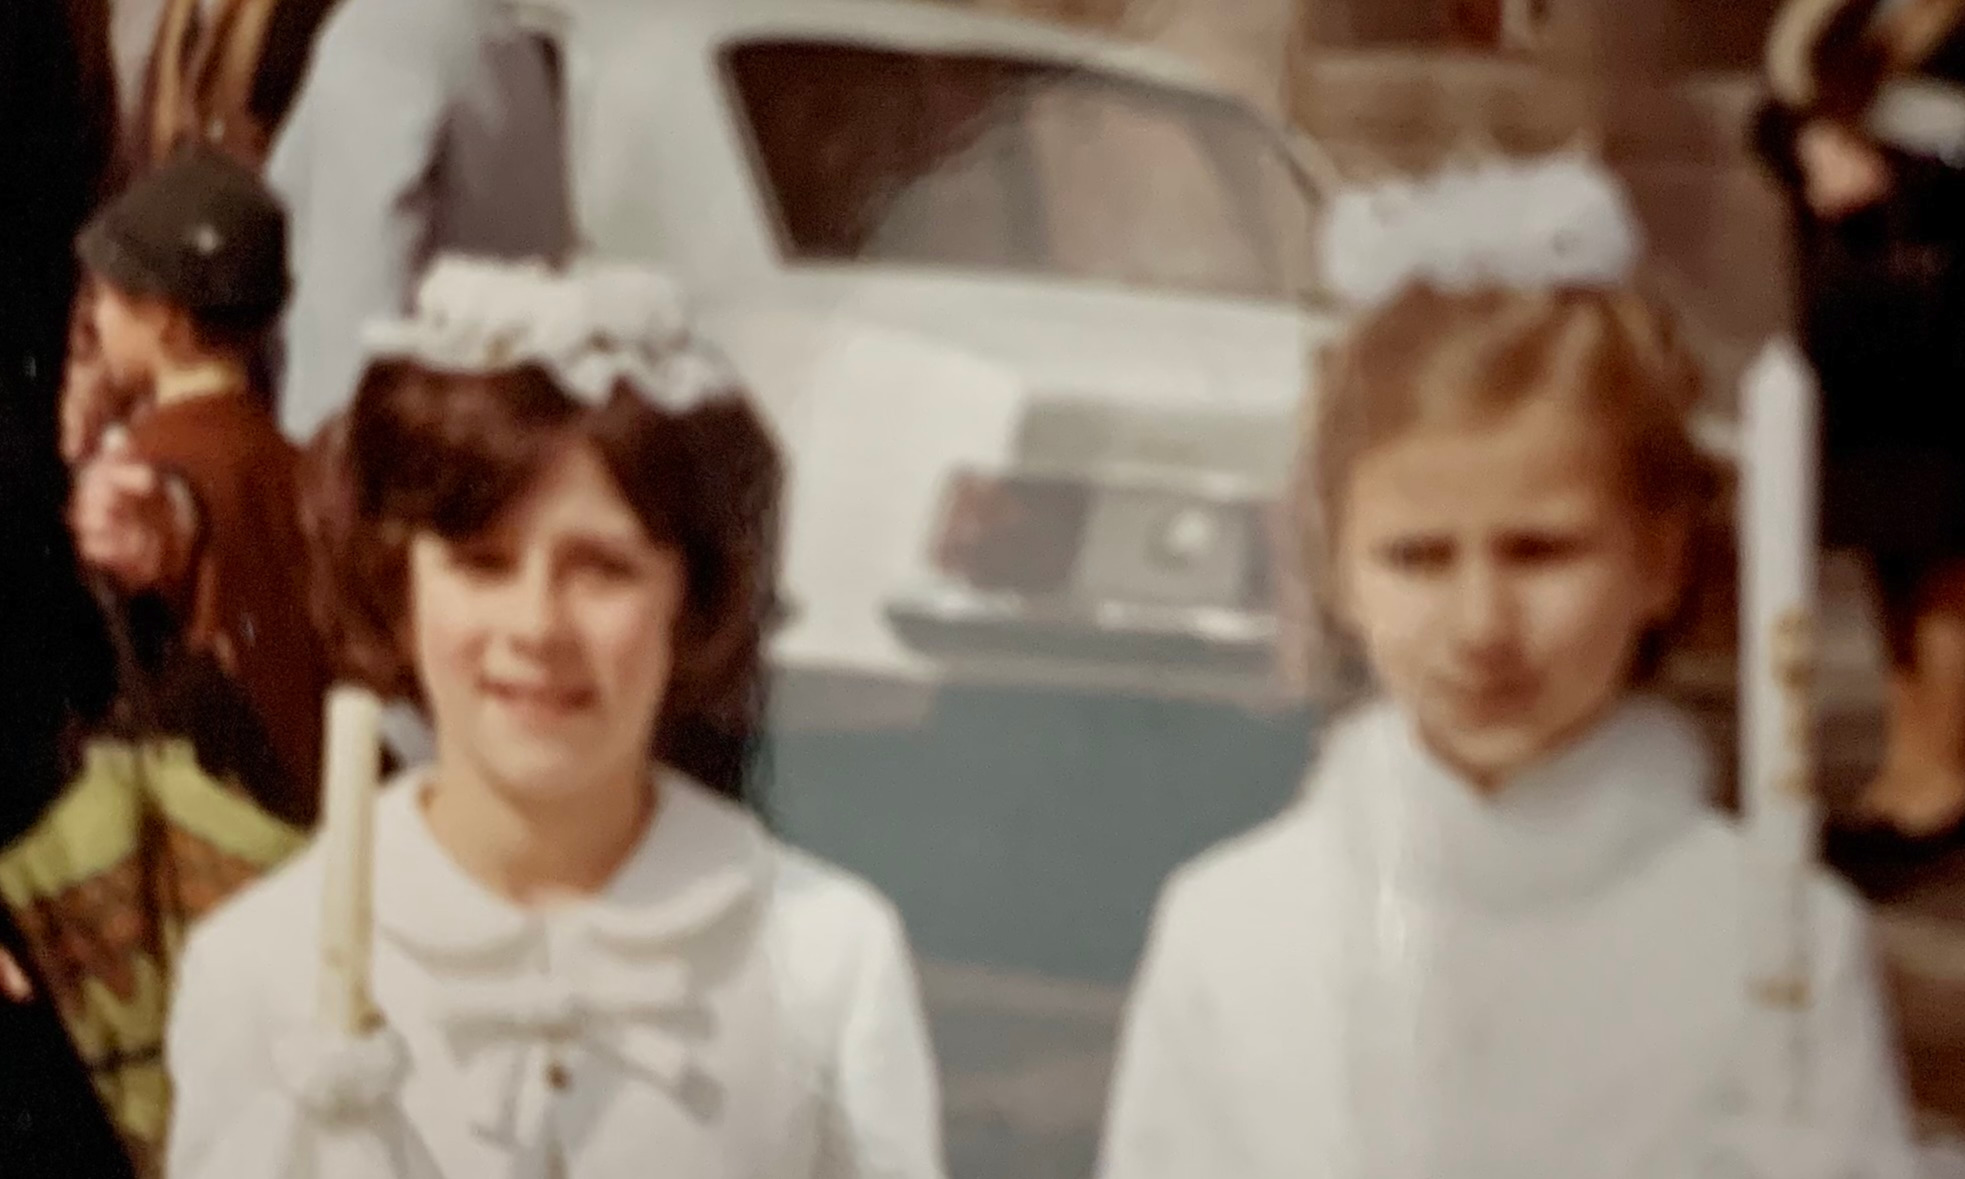 Stiefzwillinge | story.one